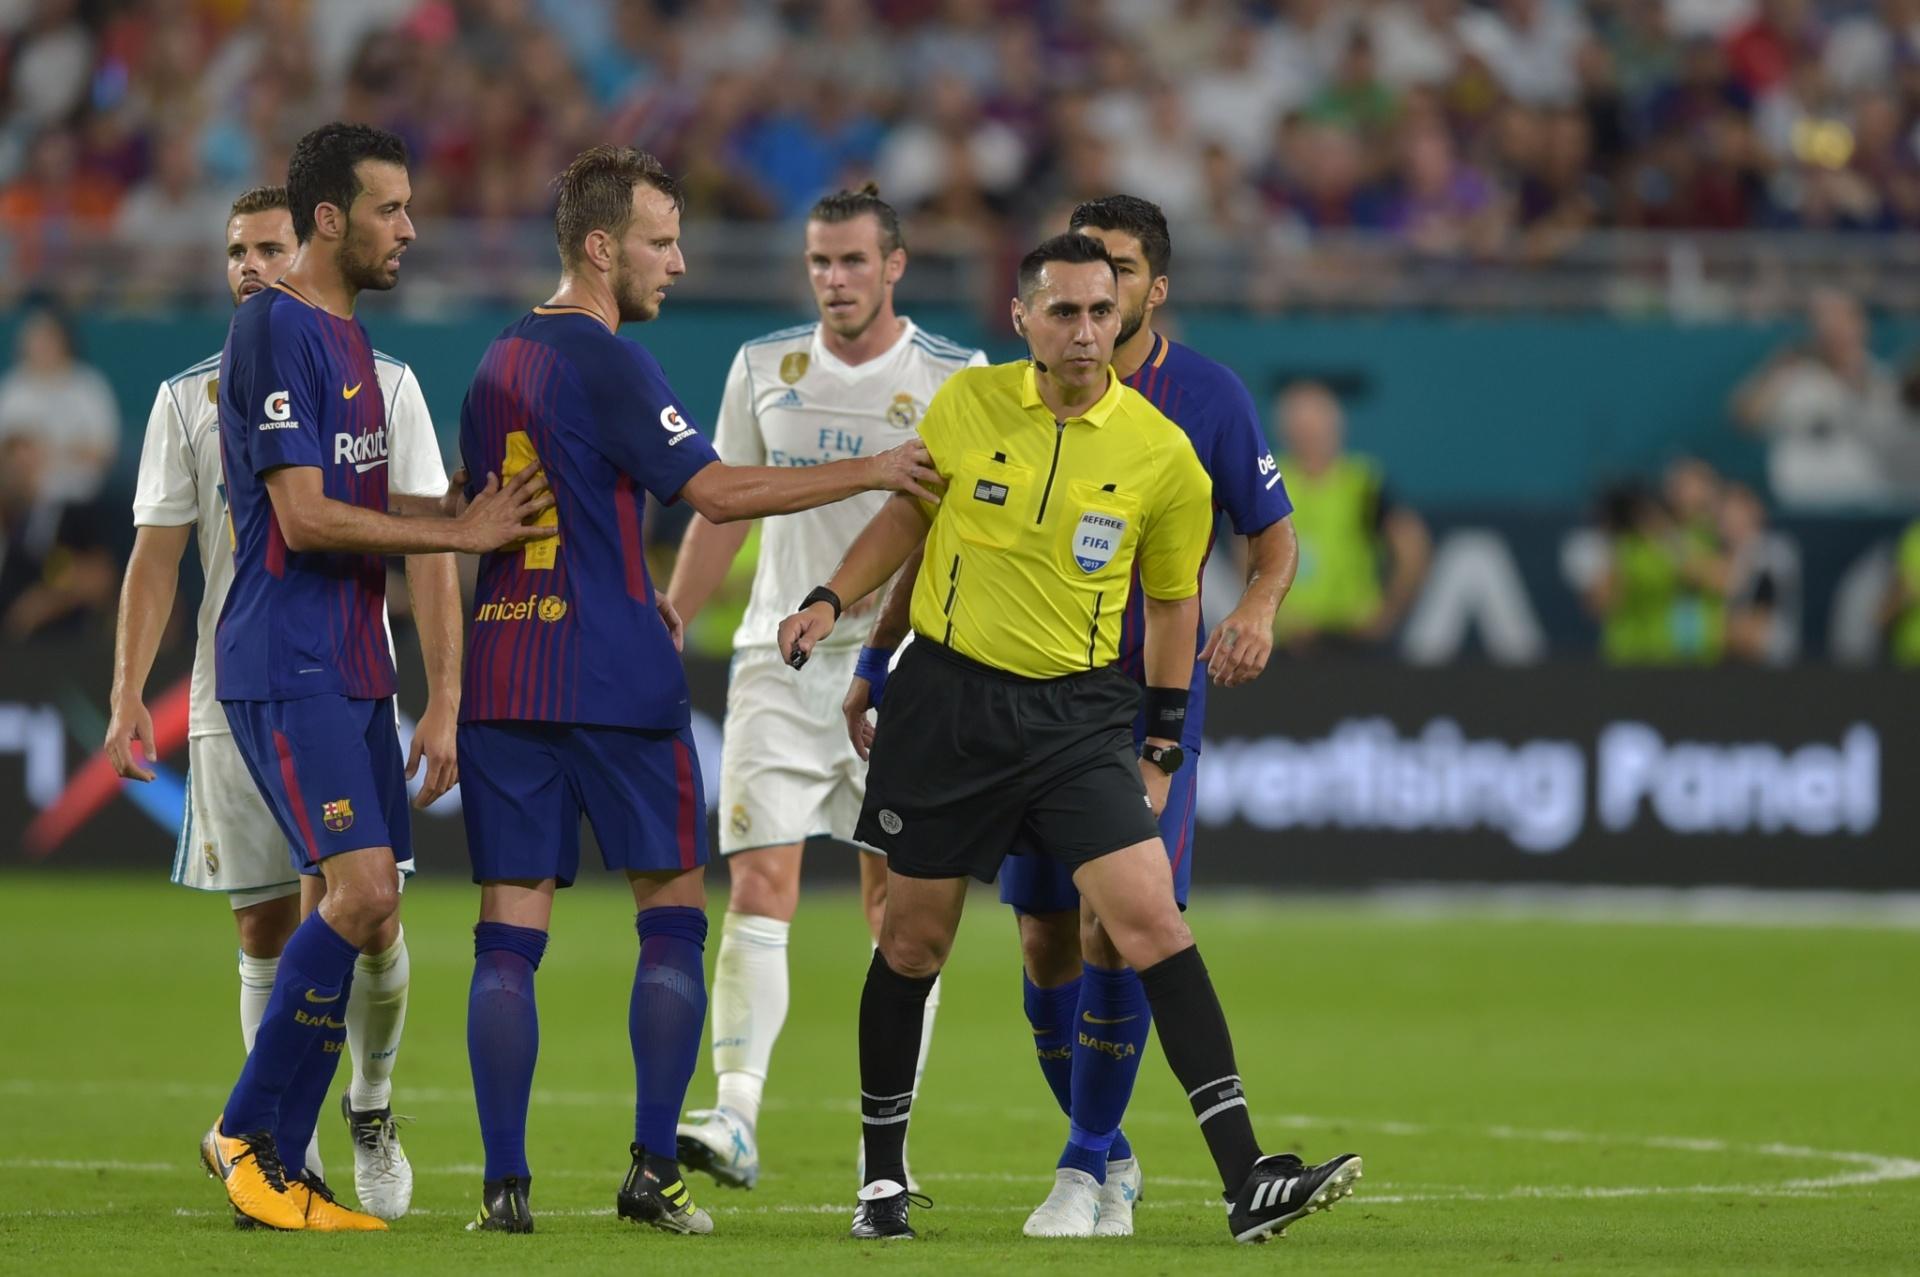 Árbitro acusado de ofender Rakitic apitará final do Mundial de Clubes 2018  - 21 12 2018 - UOL Esporte 9ff264b3bffa7